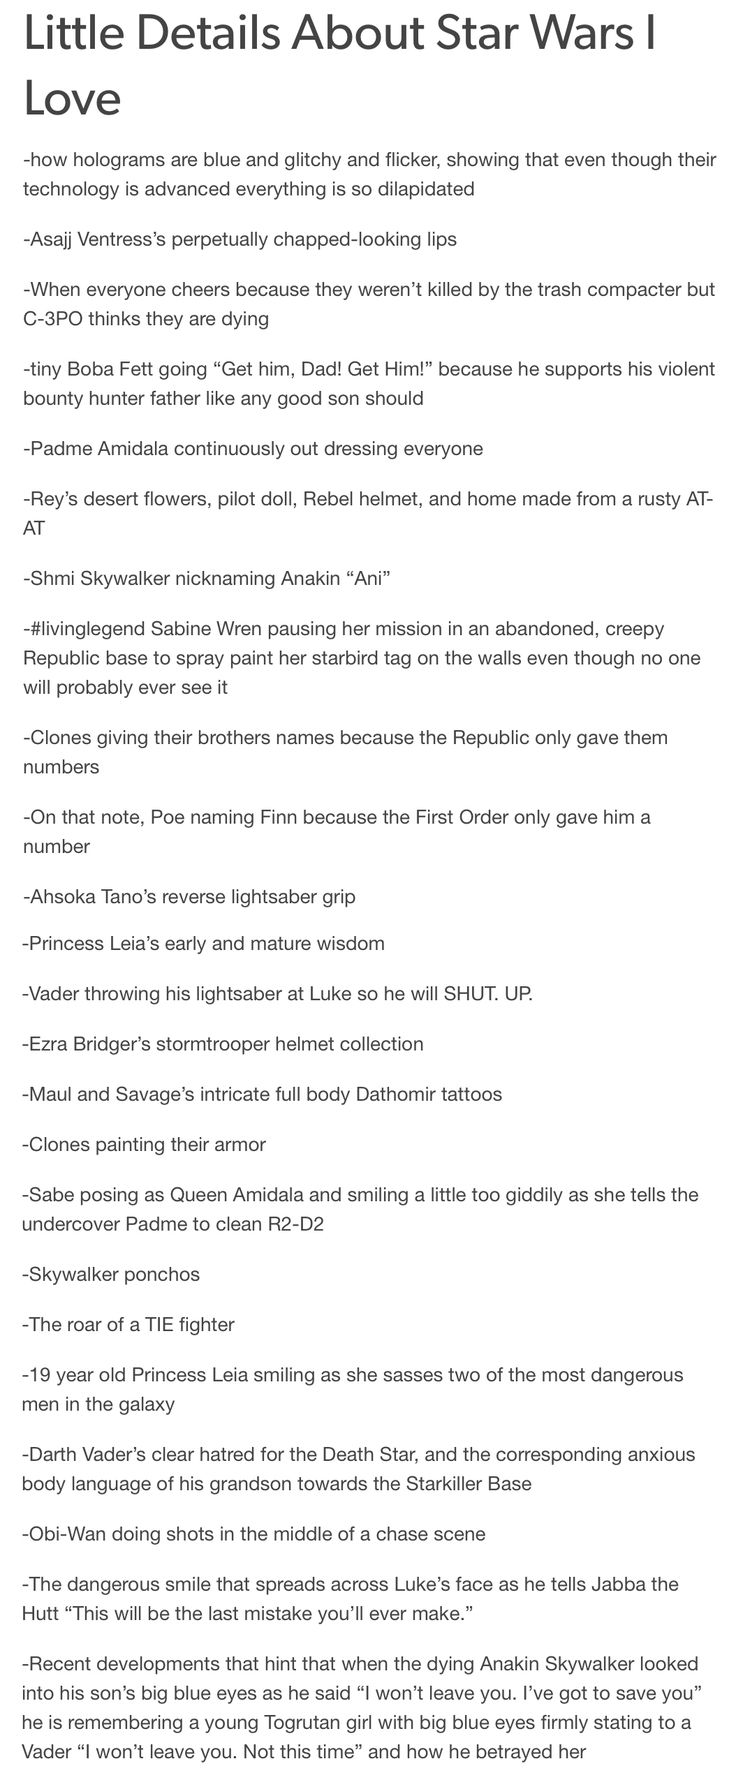 Little Details About Star Wars I Love